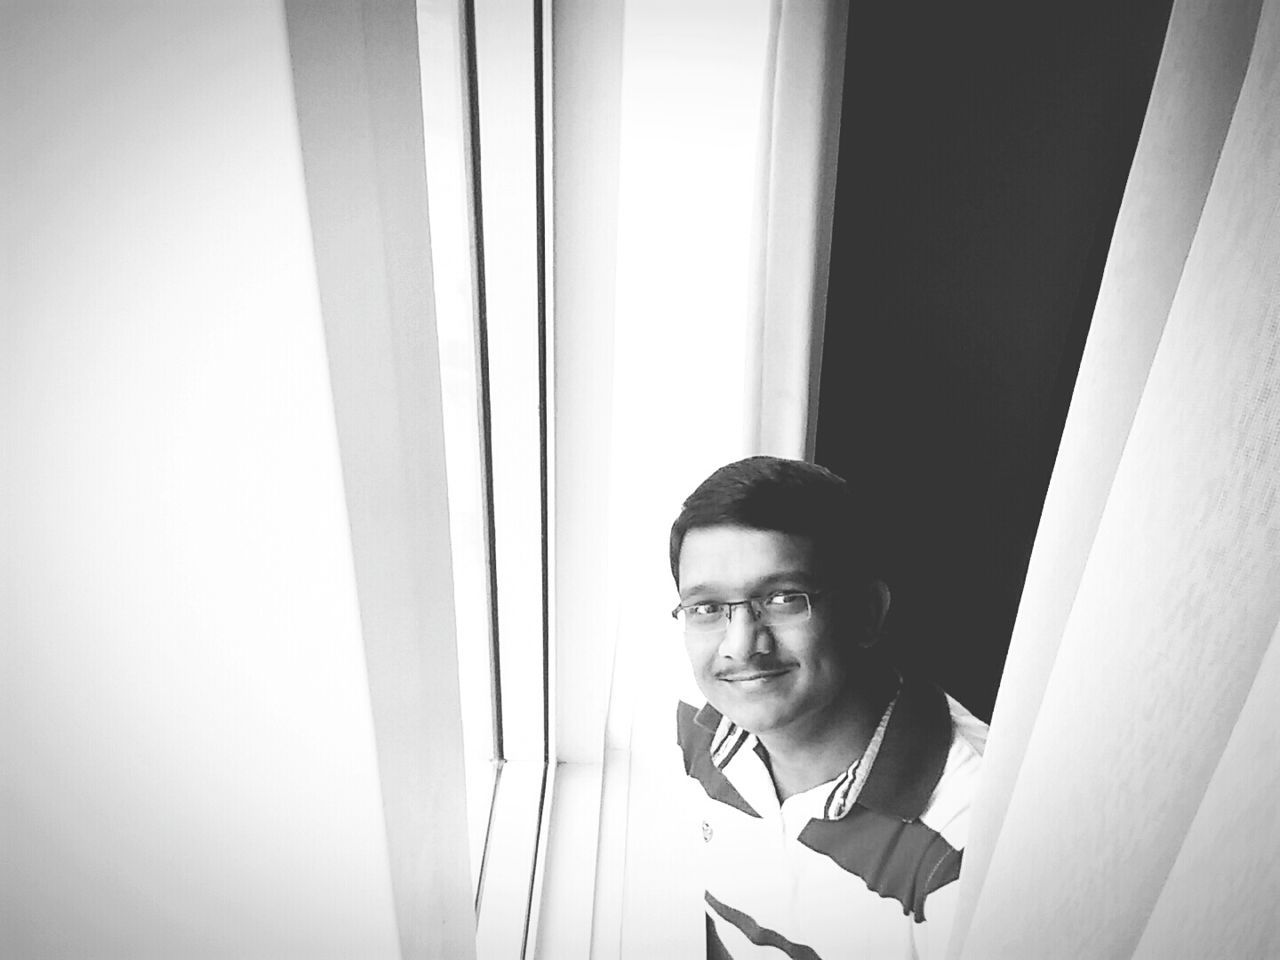 Selfie✌ Selfie Portrait Blackandwhite Photography Black & White Me Self Potrait Just Smile  Trip Photo Tamani Dubai ItsMe:)